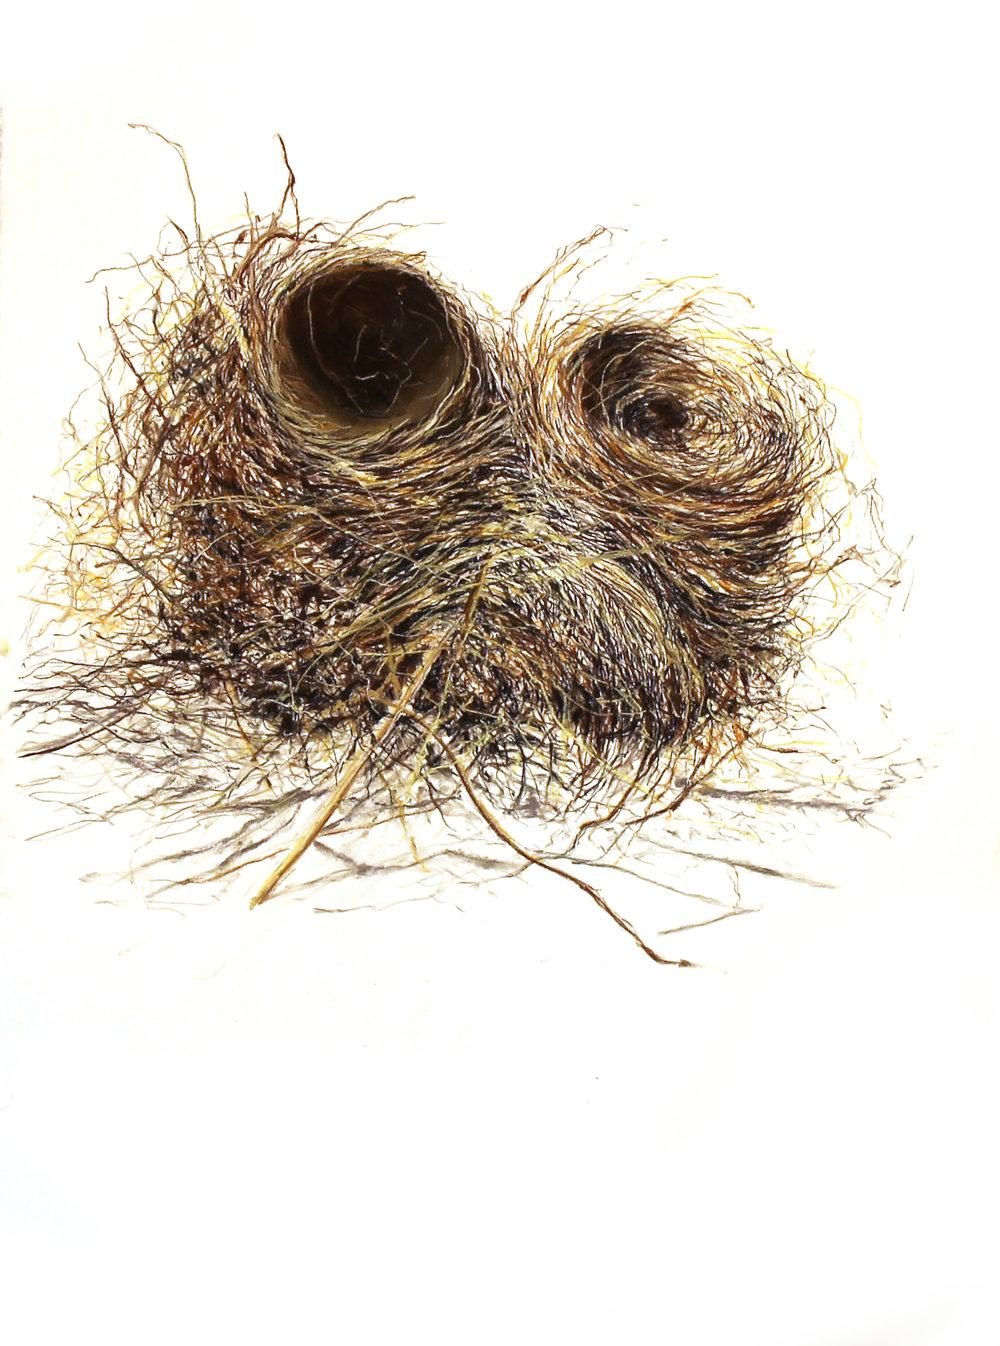 Mrs. Robin's Double Nest (2)